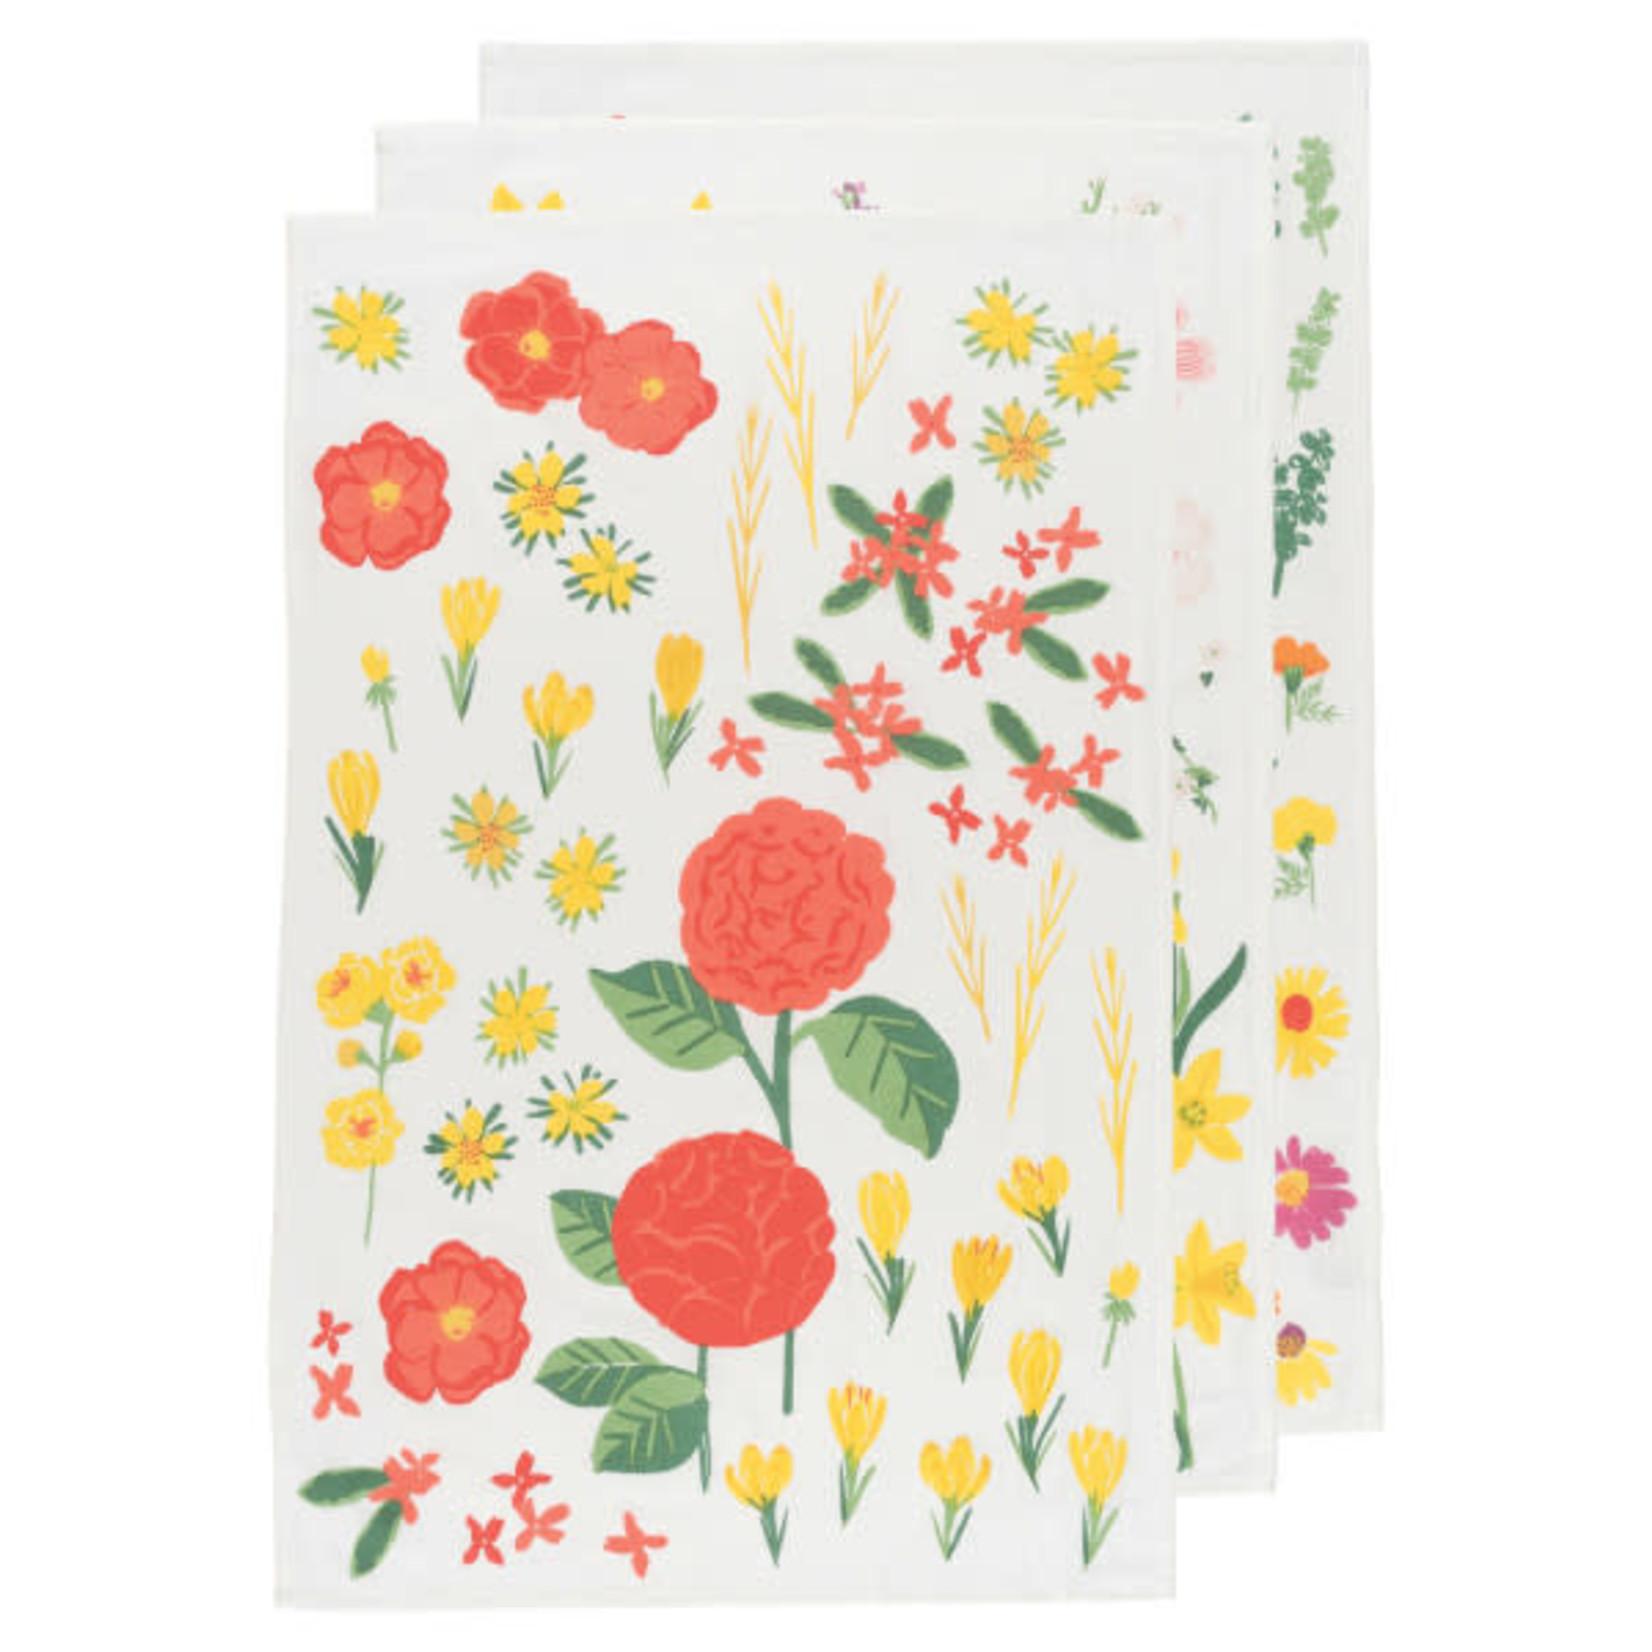 Bakers Flour Flowers - Tea Towel - Set Of 3